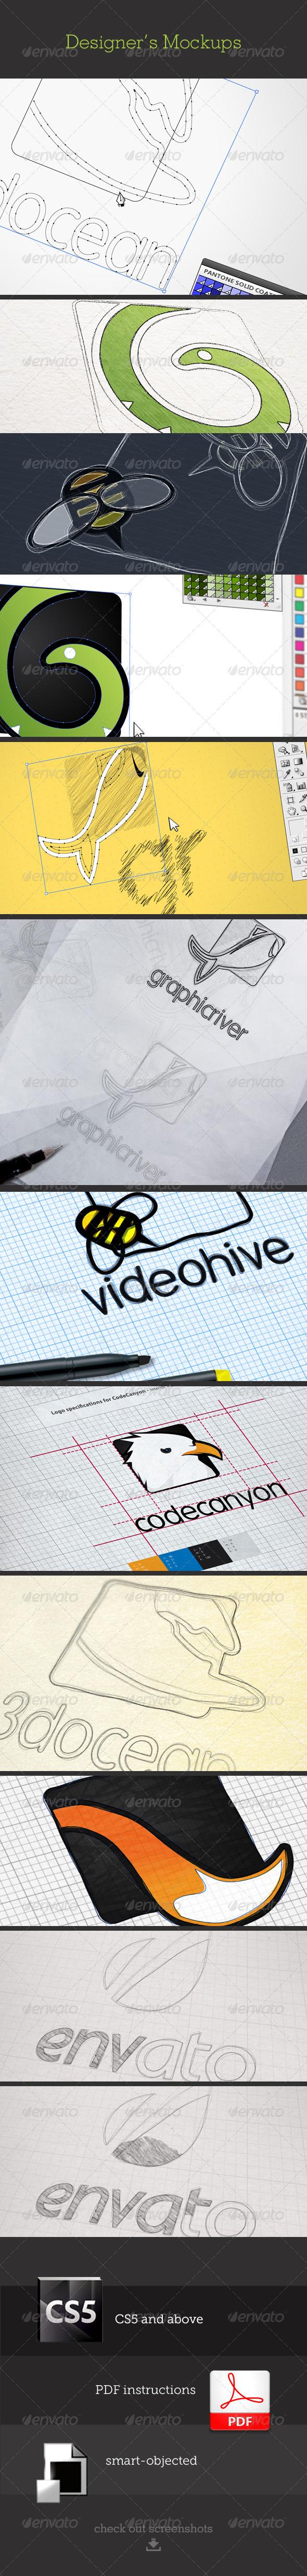 GraphicRiver Designers Mockups 6039586